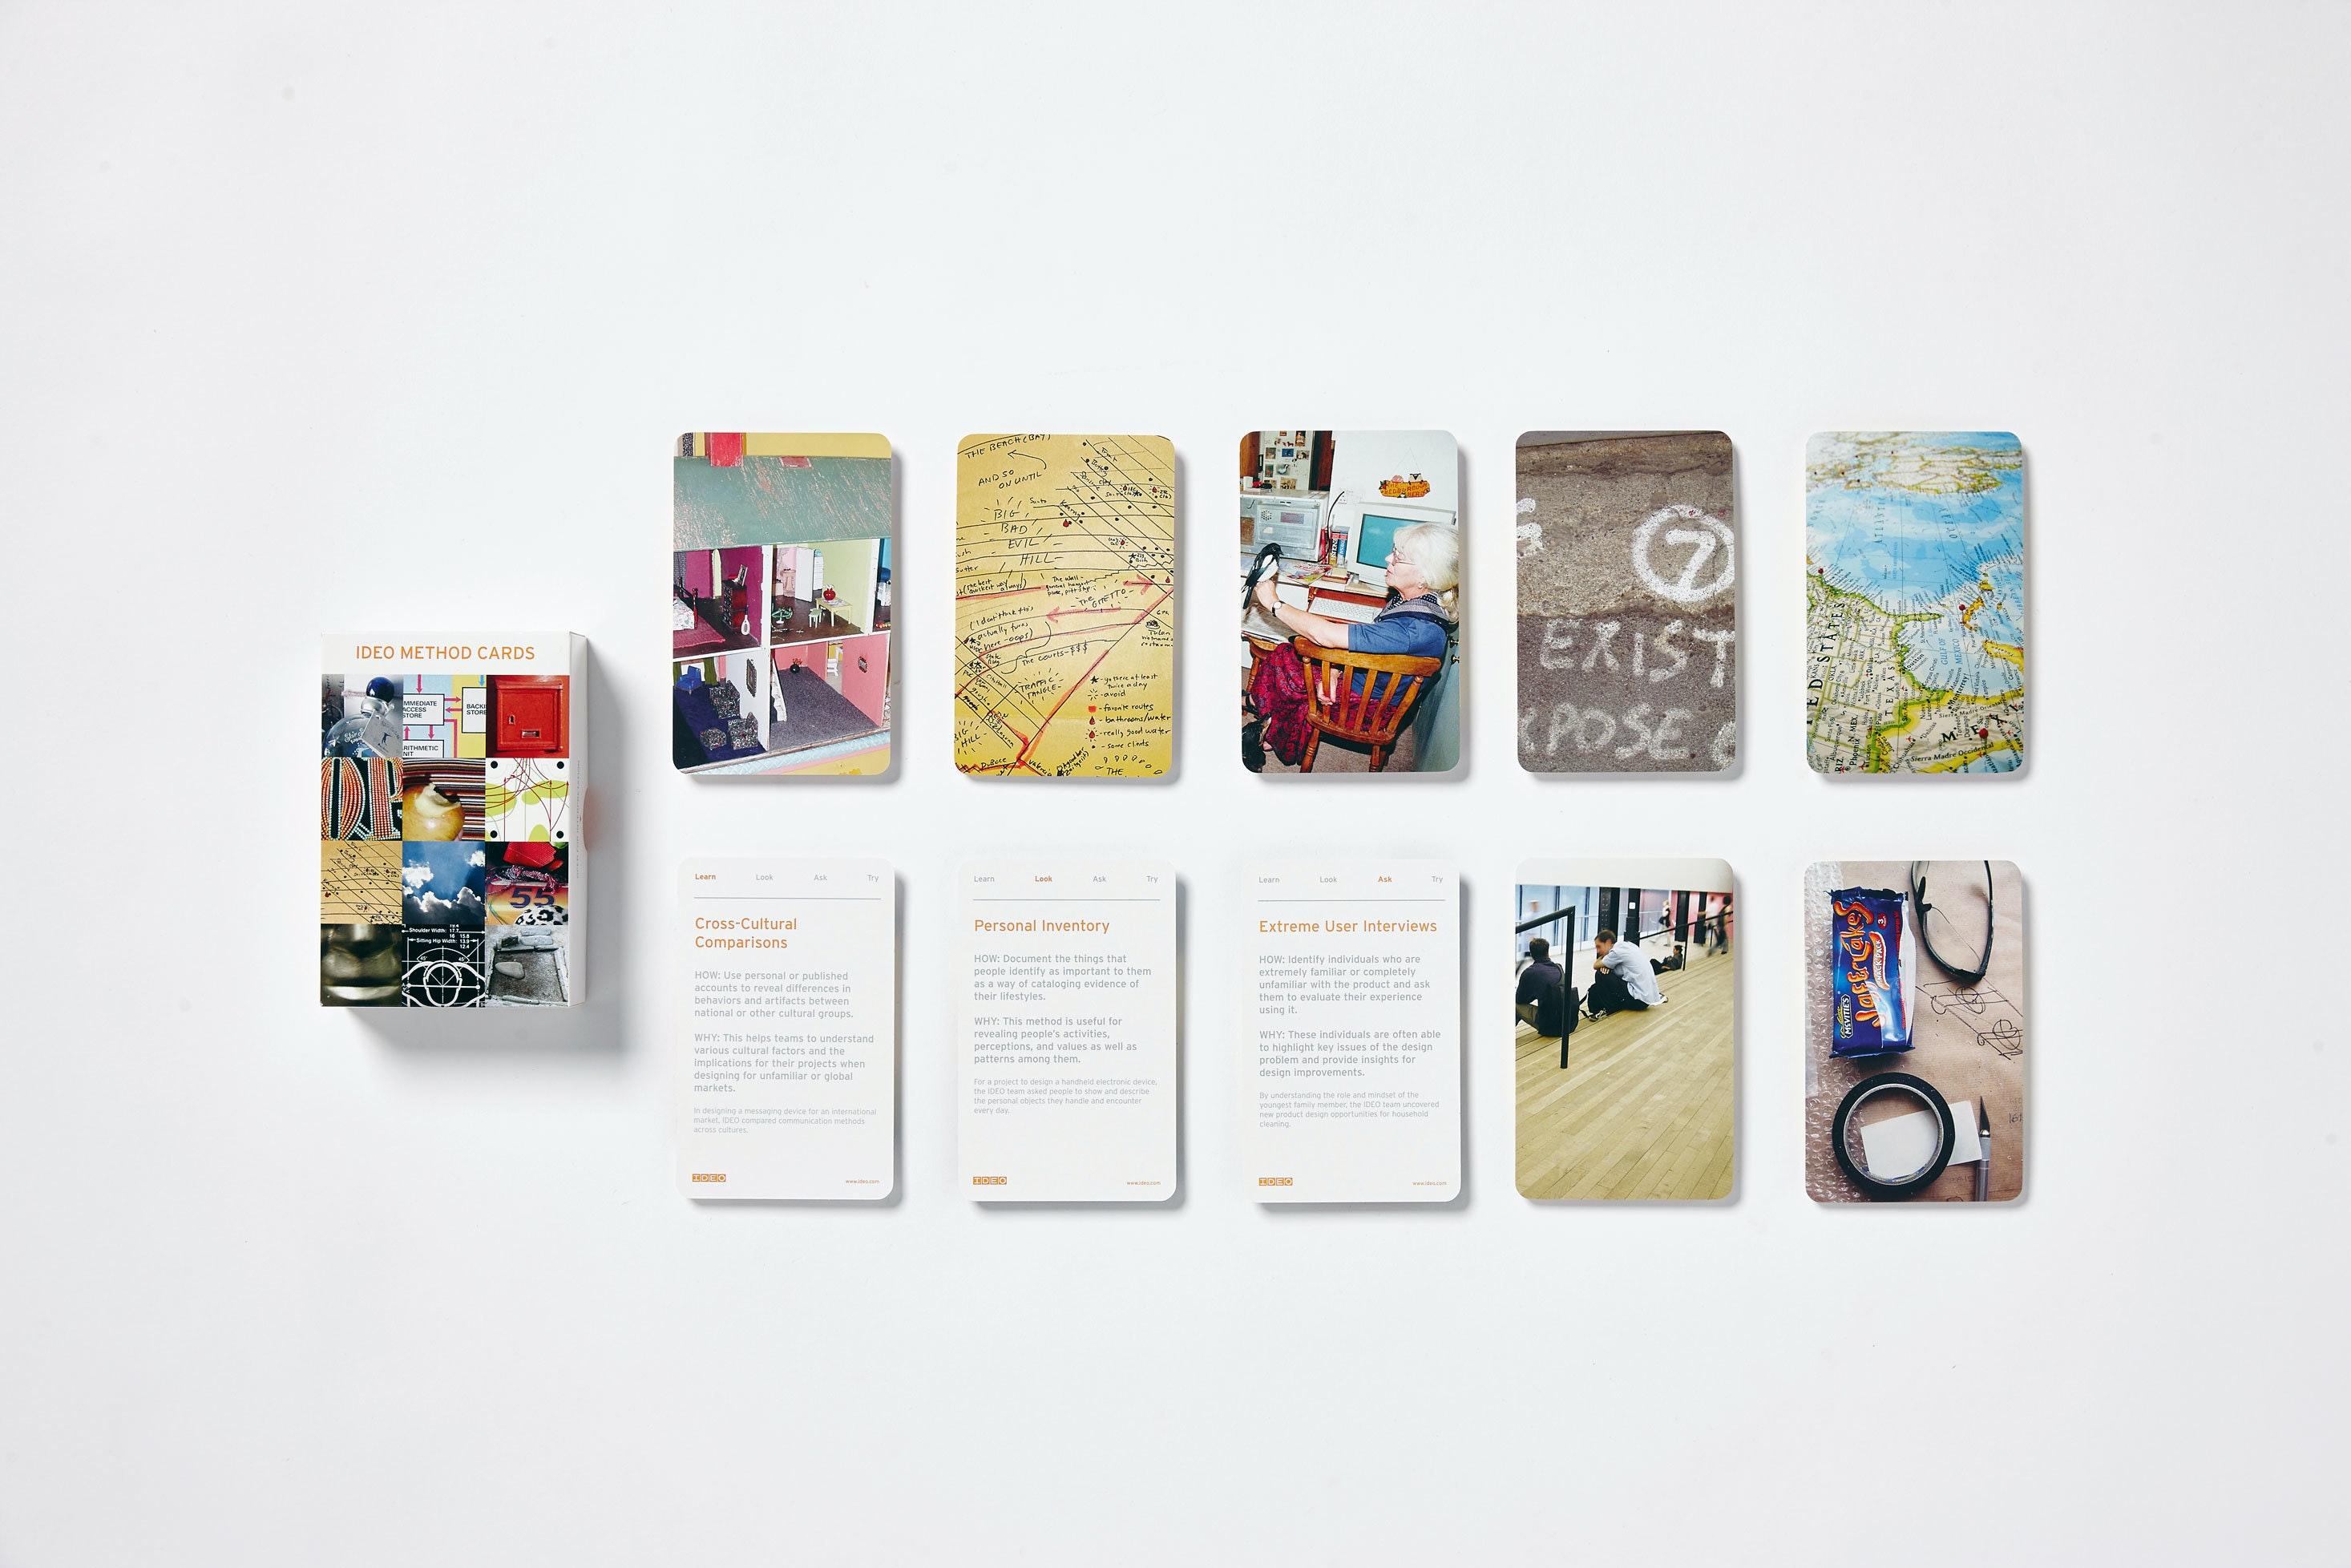 Cards ideo pdf method